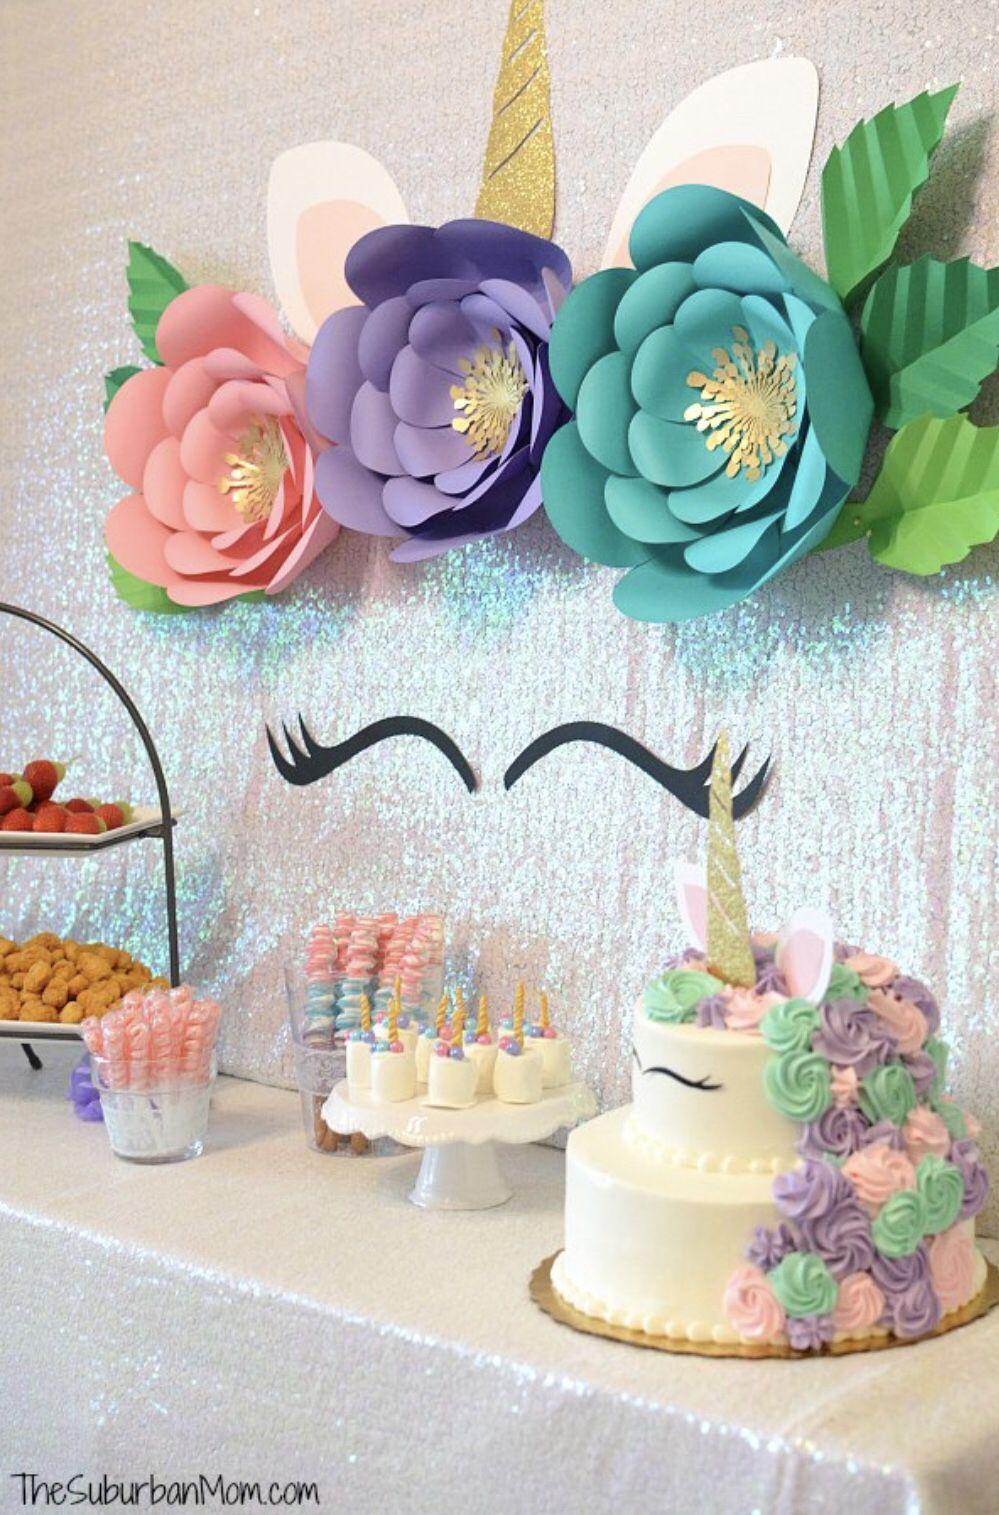 Unicorn Flower Backdrop Diy Unicorn Party Unicorn Birthday Etsy Unicorn Birthday Party Cake Unicorn Birthday Party Decorations Birthday Party Cake